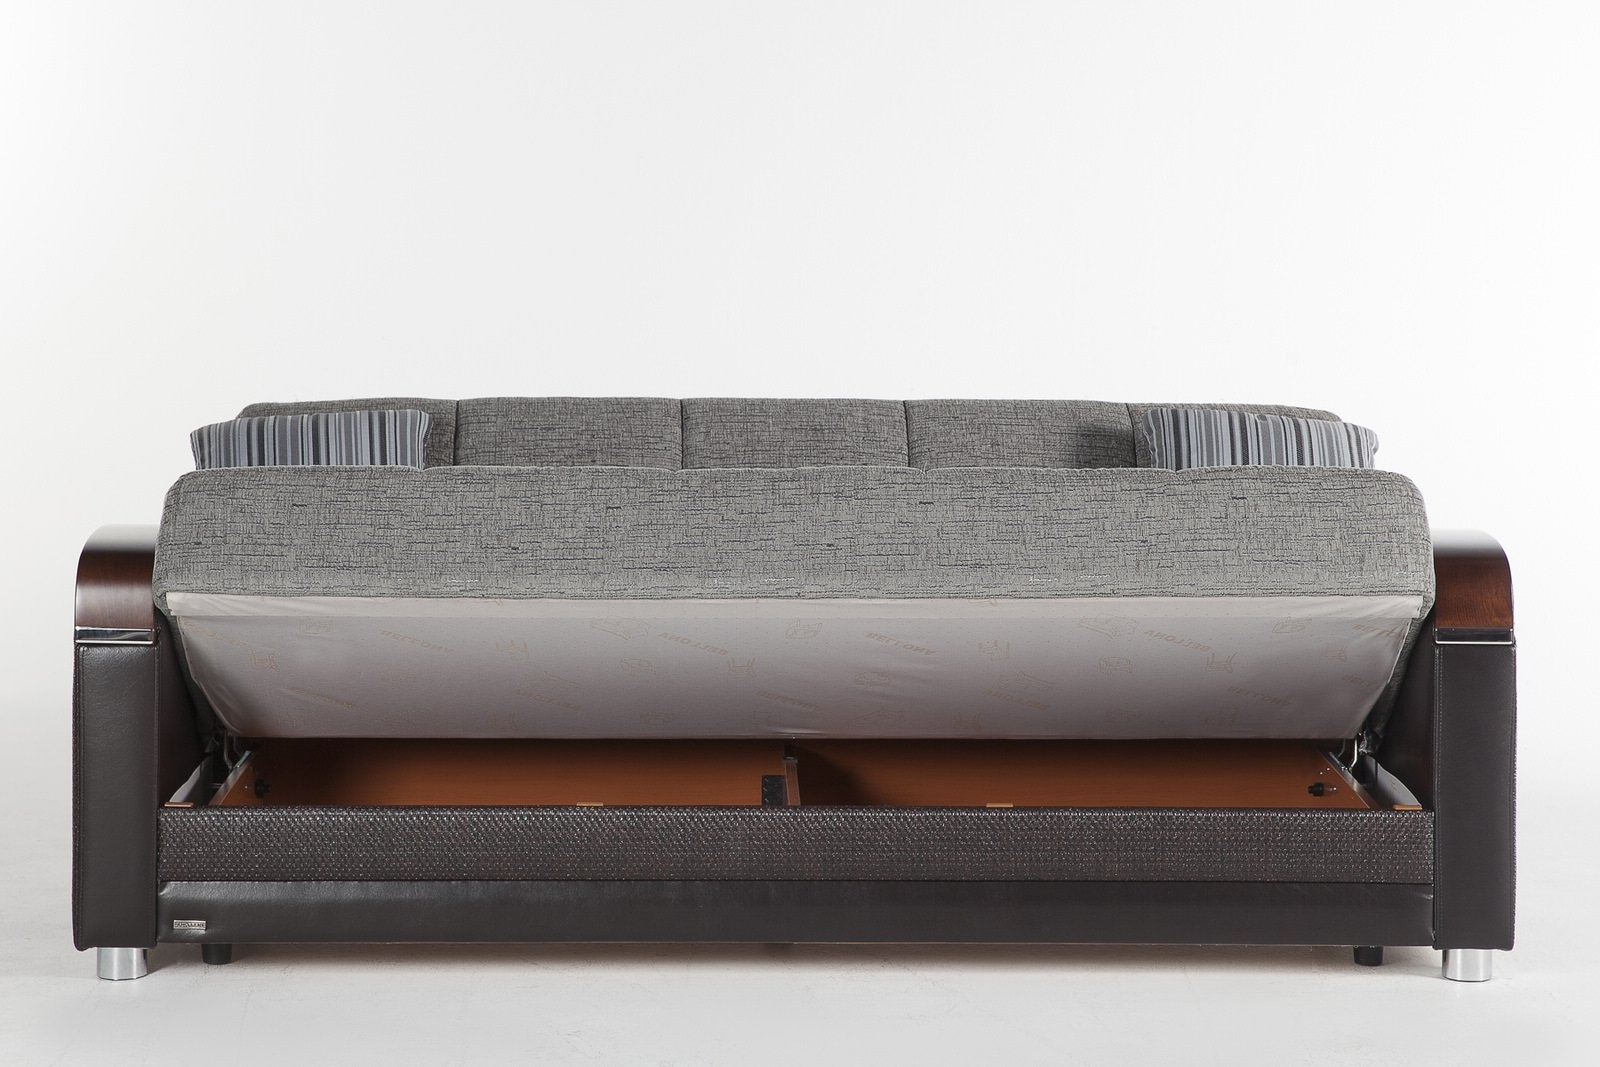 Luna Fulya Gray Convertible Sofa Bedistikbal (Sunset) Regarding Recent Convertible Sofas (View 10 of 15)